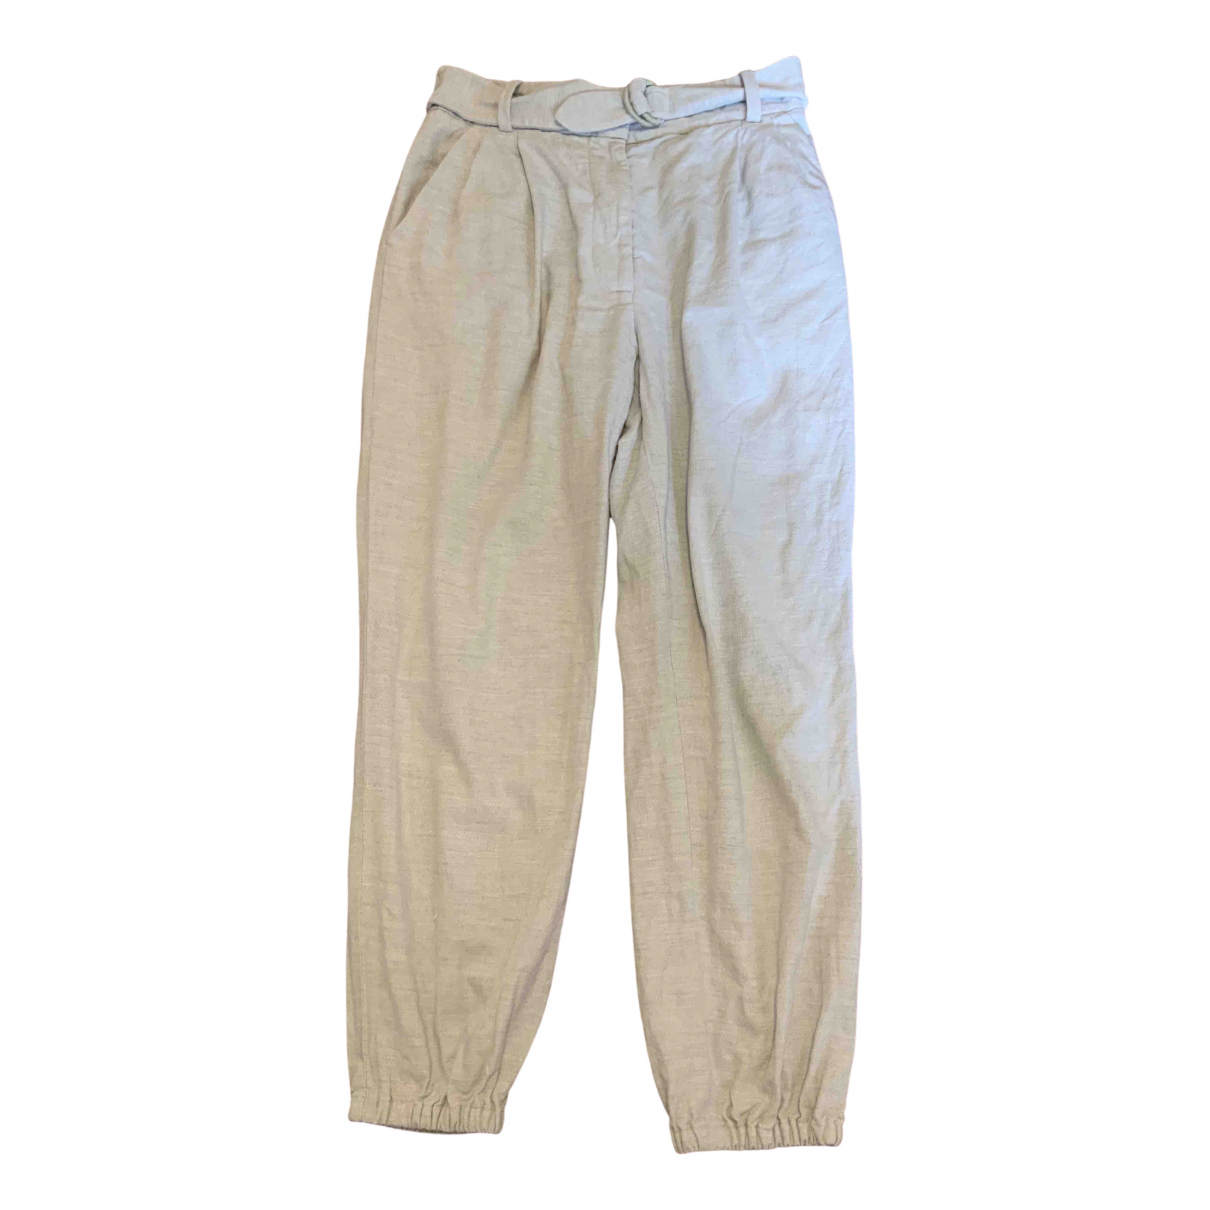 3.1 Phillip Lim \N Beige Cotton Trousers for Women 2 0-5